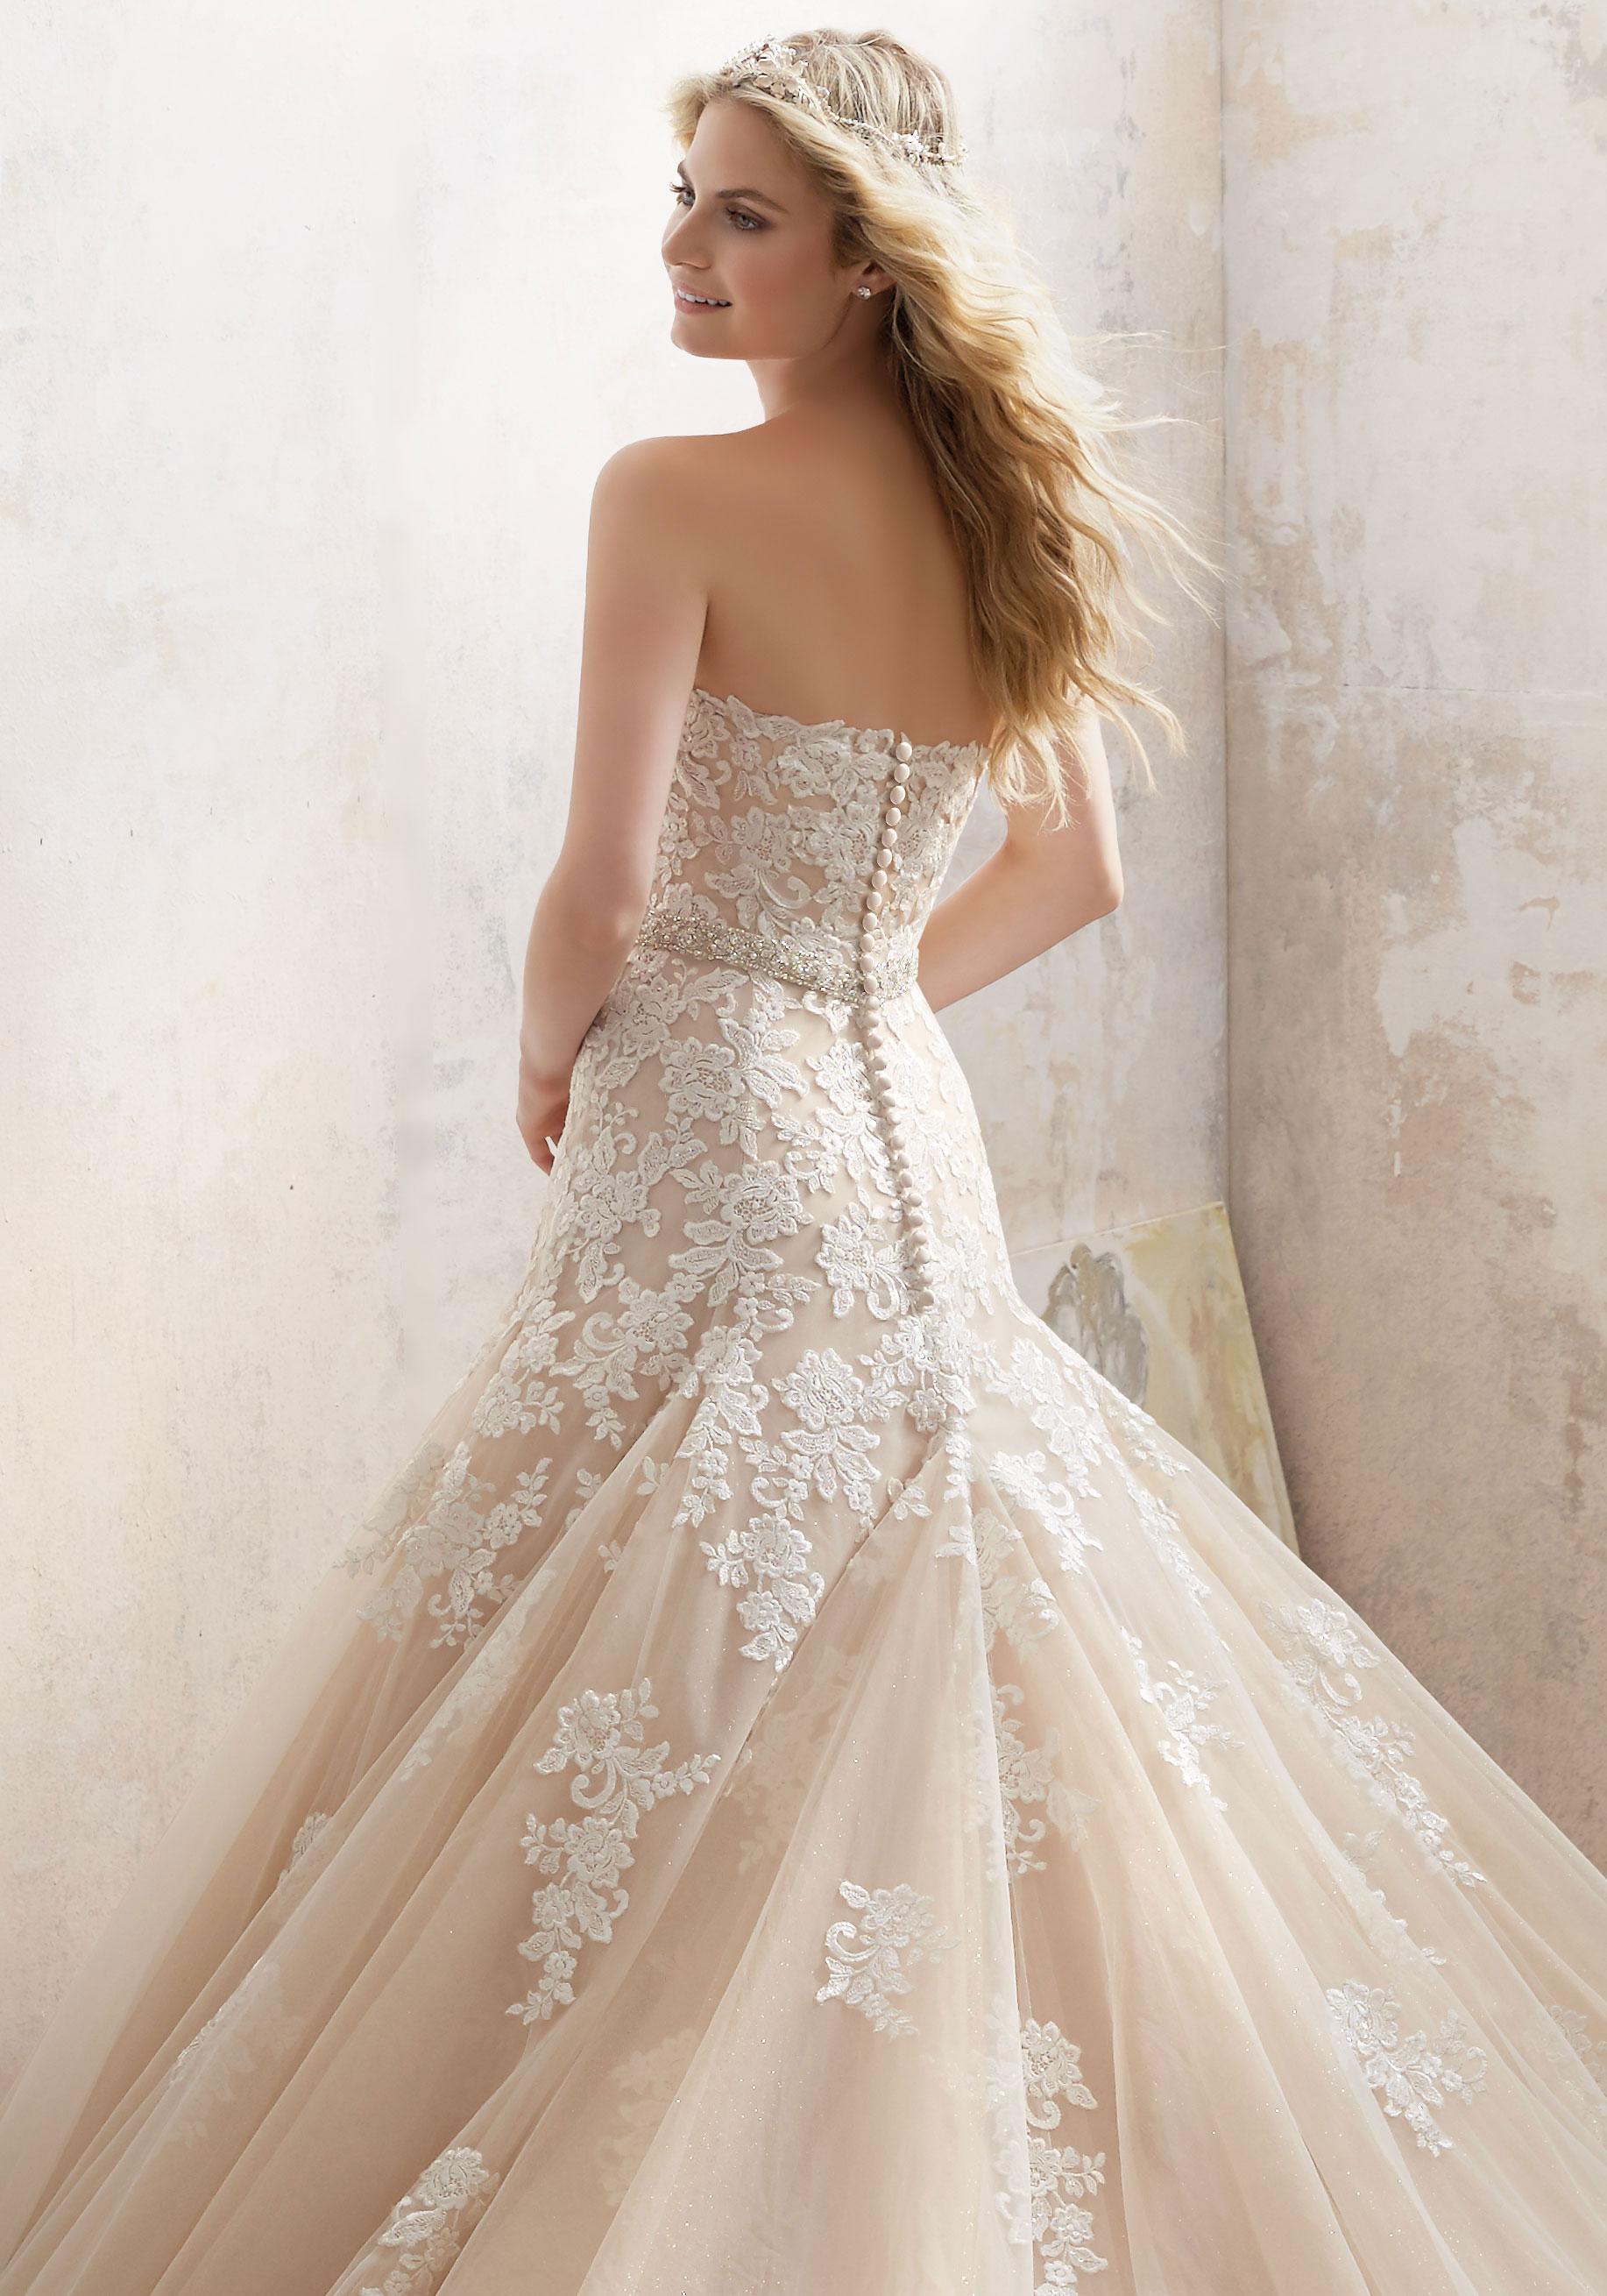 Where to buy mori lee wedding dresses